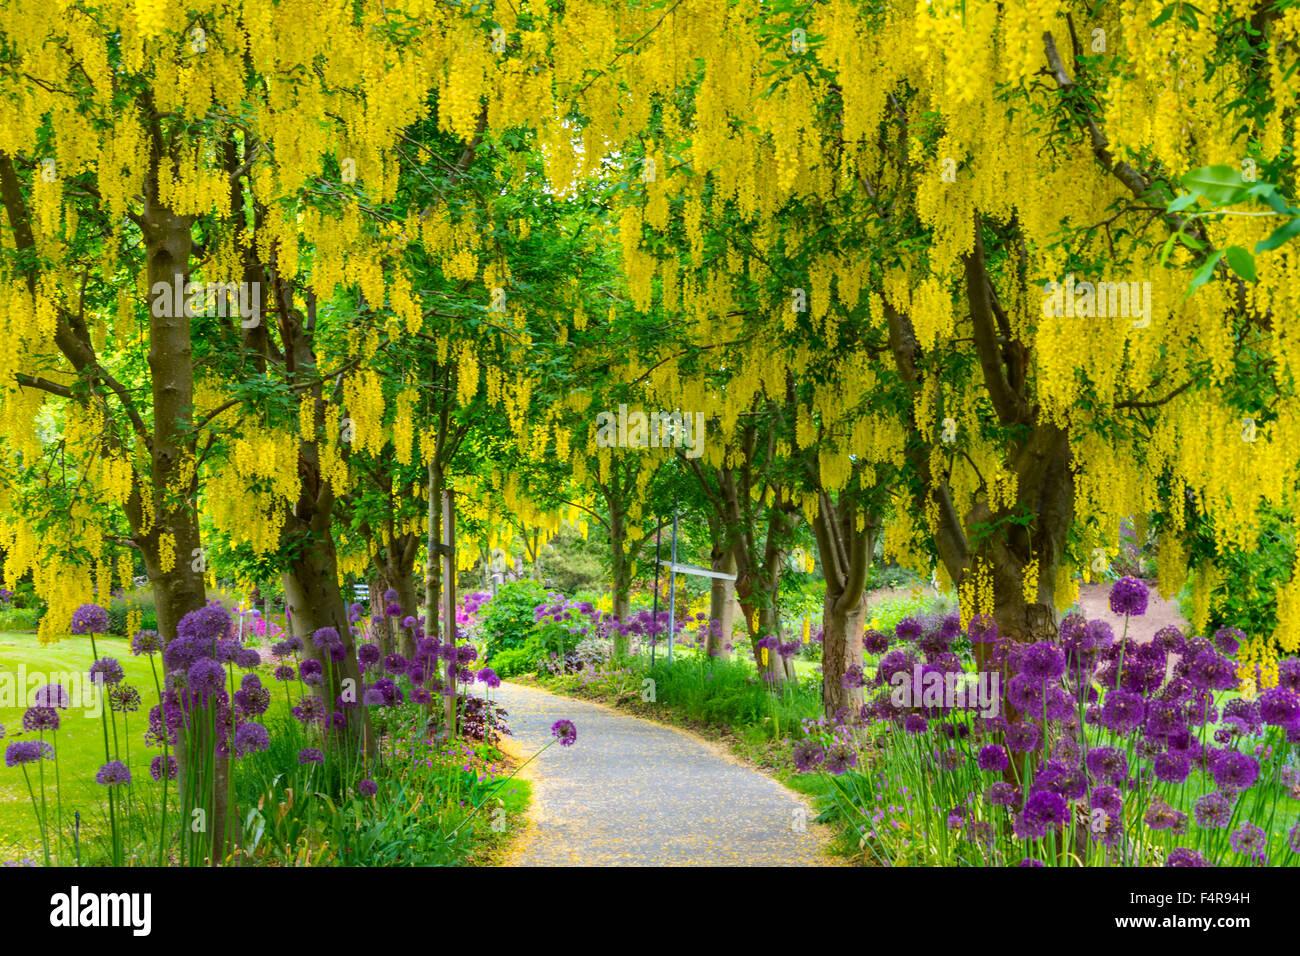 Exceptionnel British Columbia, Canada, Vancouver VanDusen, Botanical Garden, Botanical,  Garden, Summer, Way